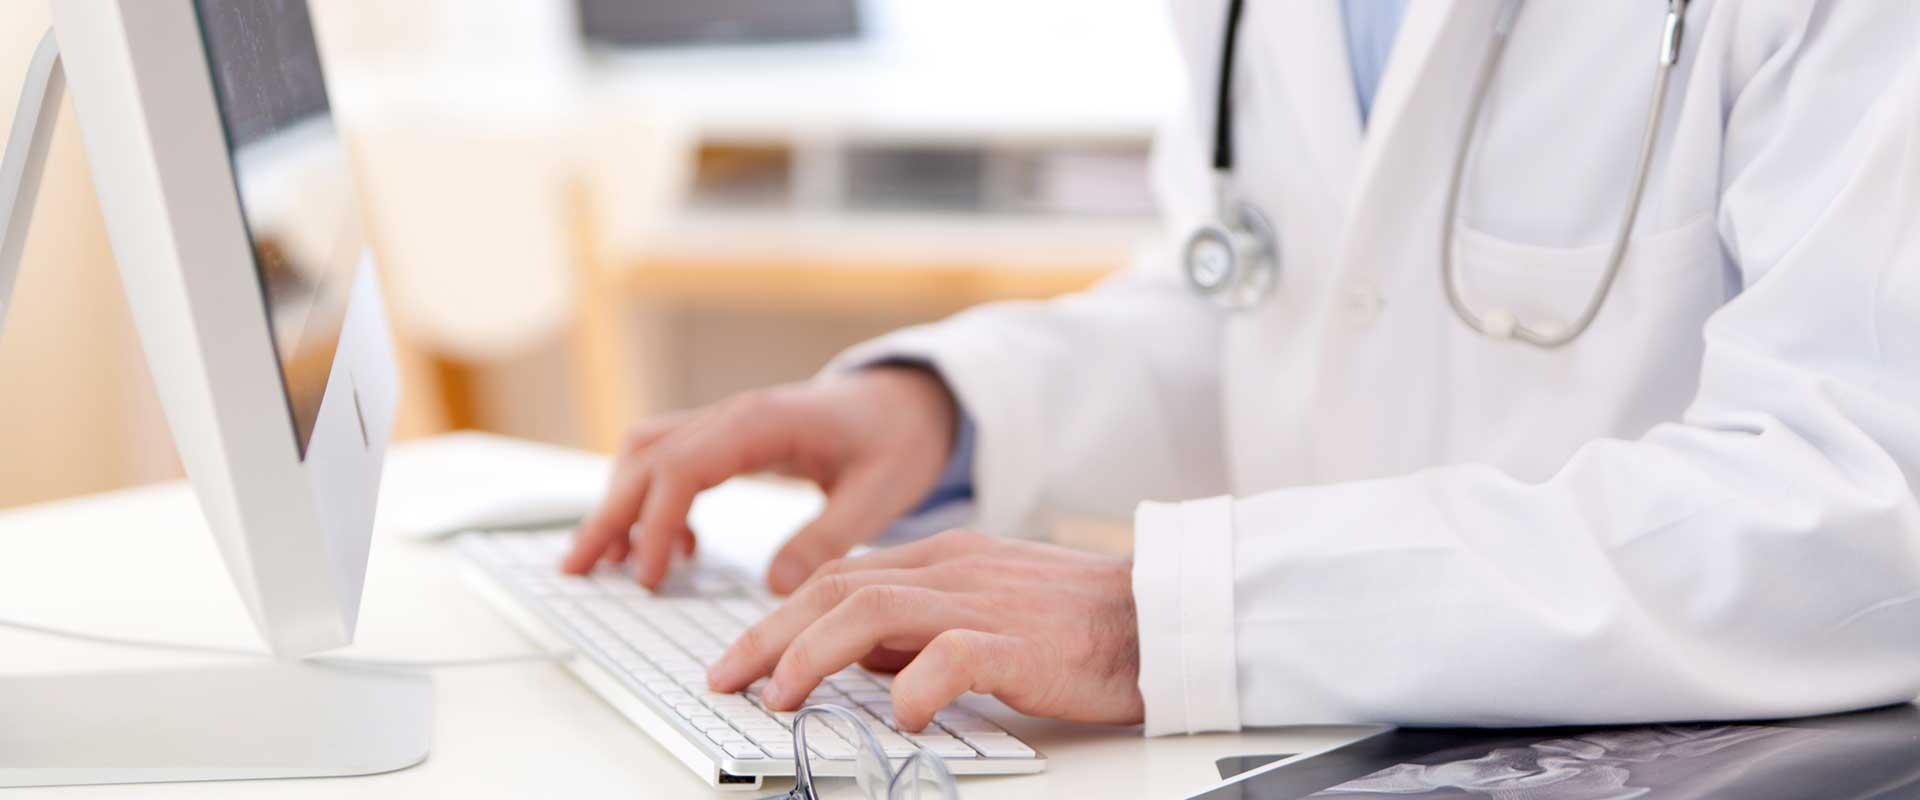 Best 10 Vet Telemedicine Software and Mobile Apps